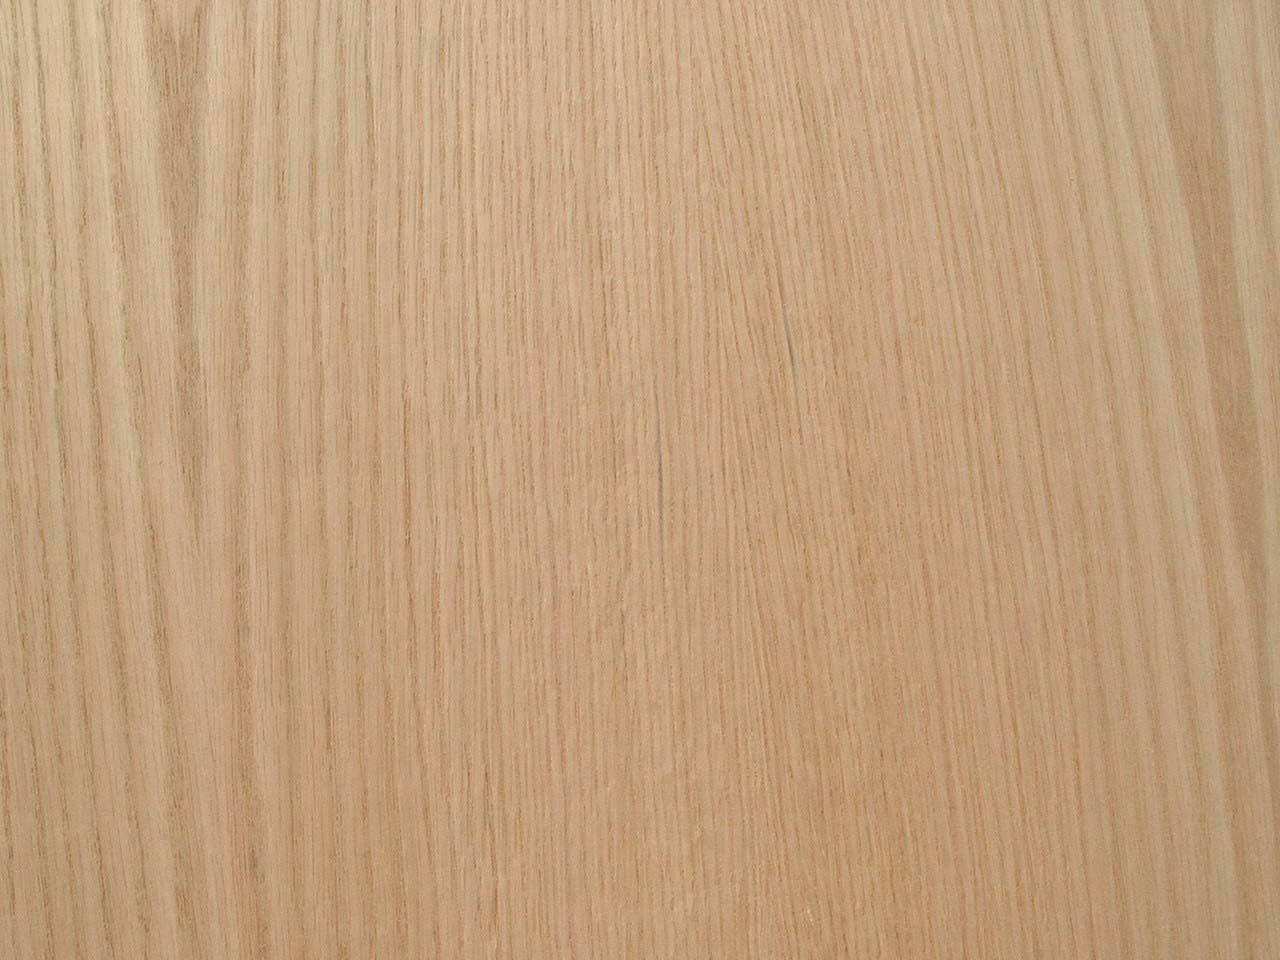 Red Oak Flat Sawn